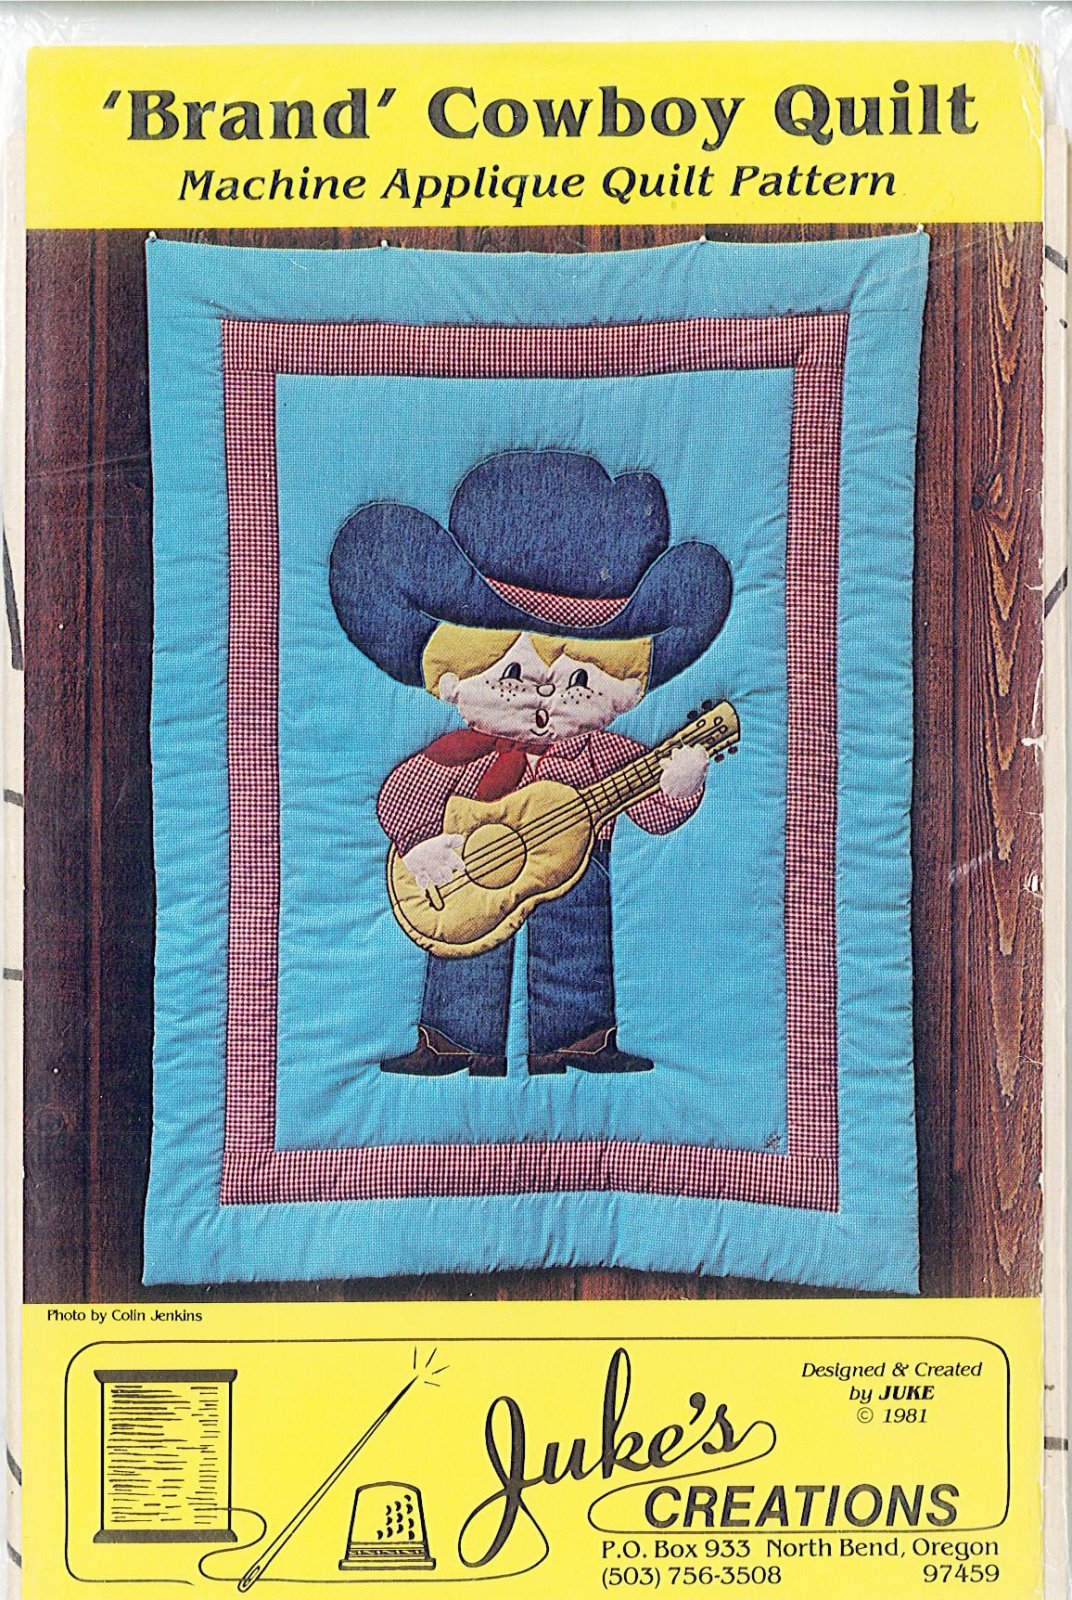 JUKE'S CREATIONS - 'Brand' Cowboy Quilt